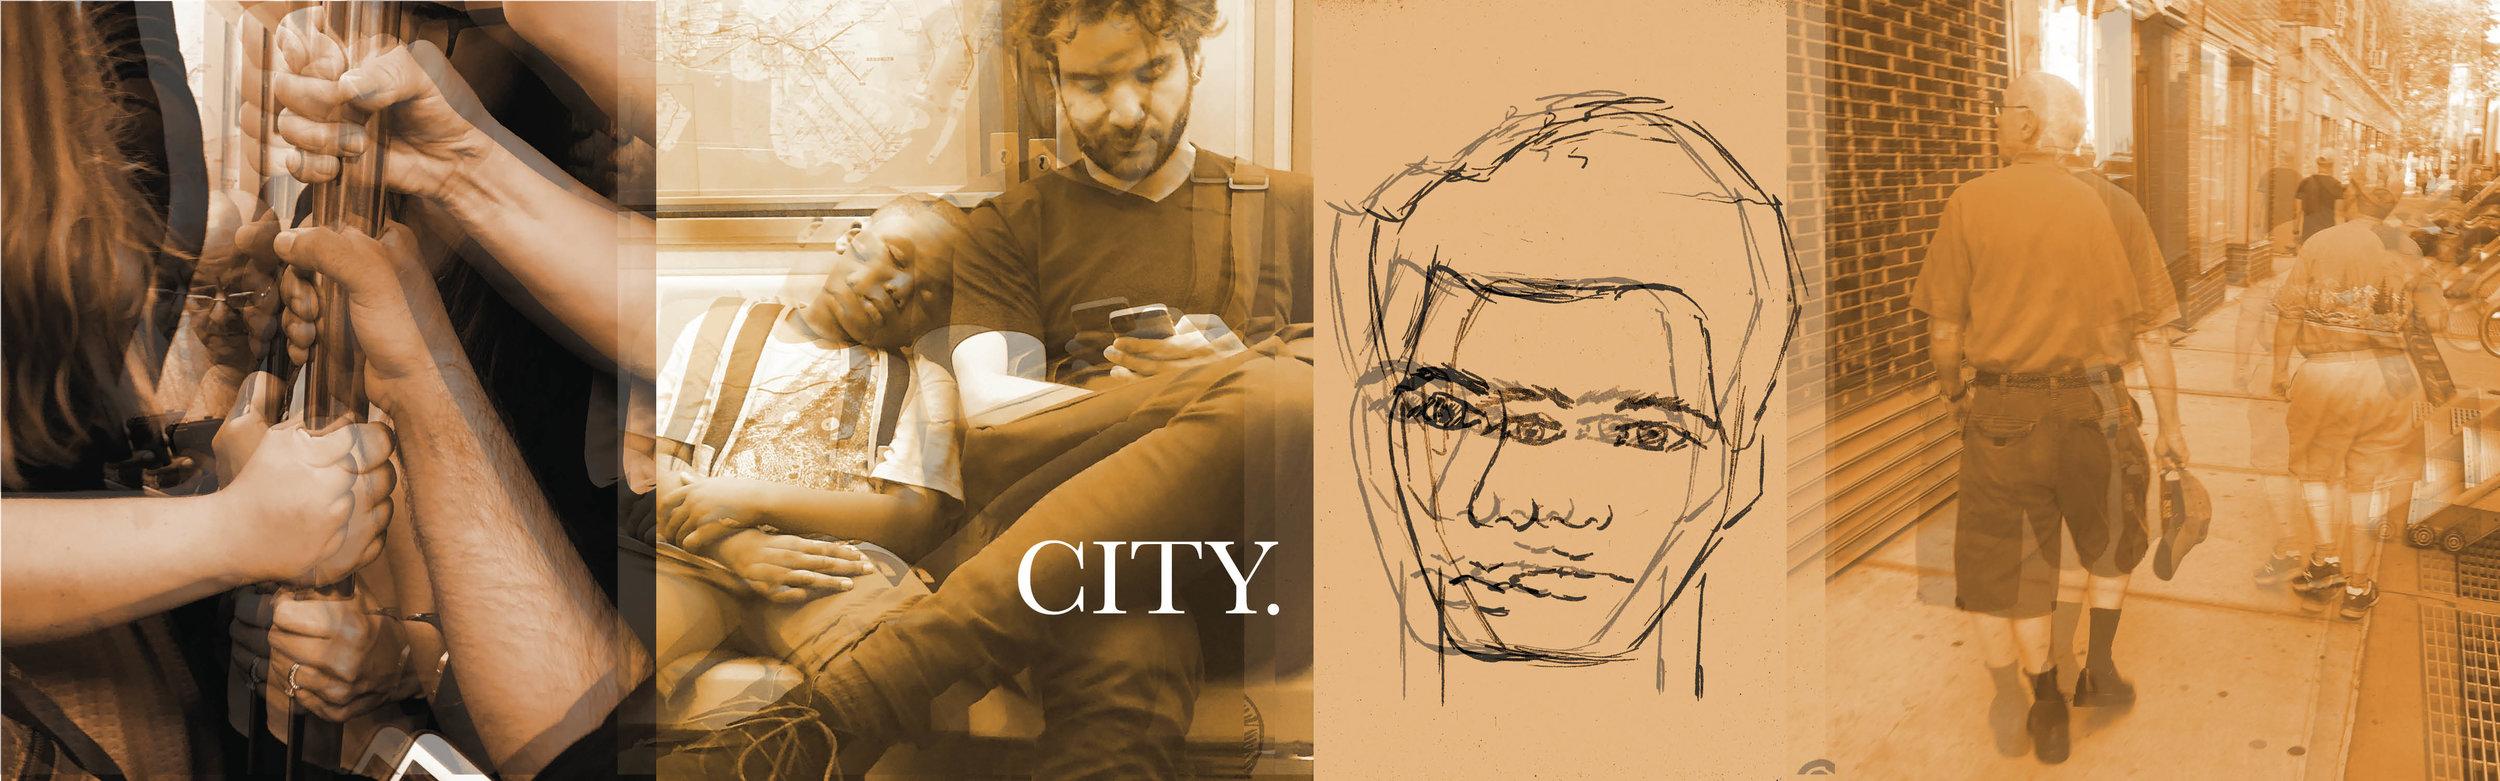 city22.jpg